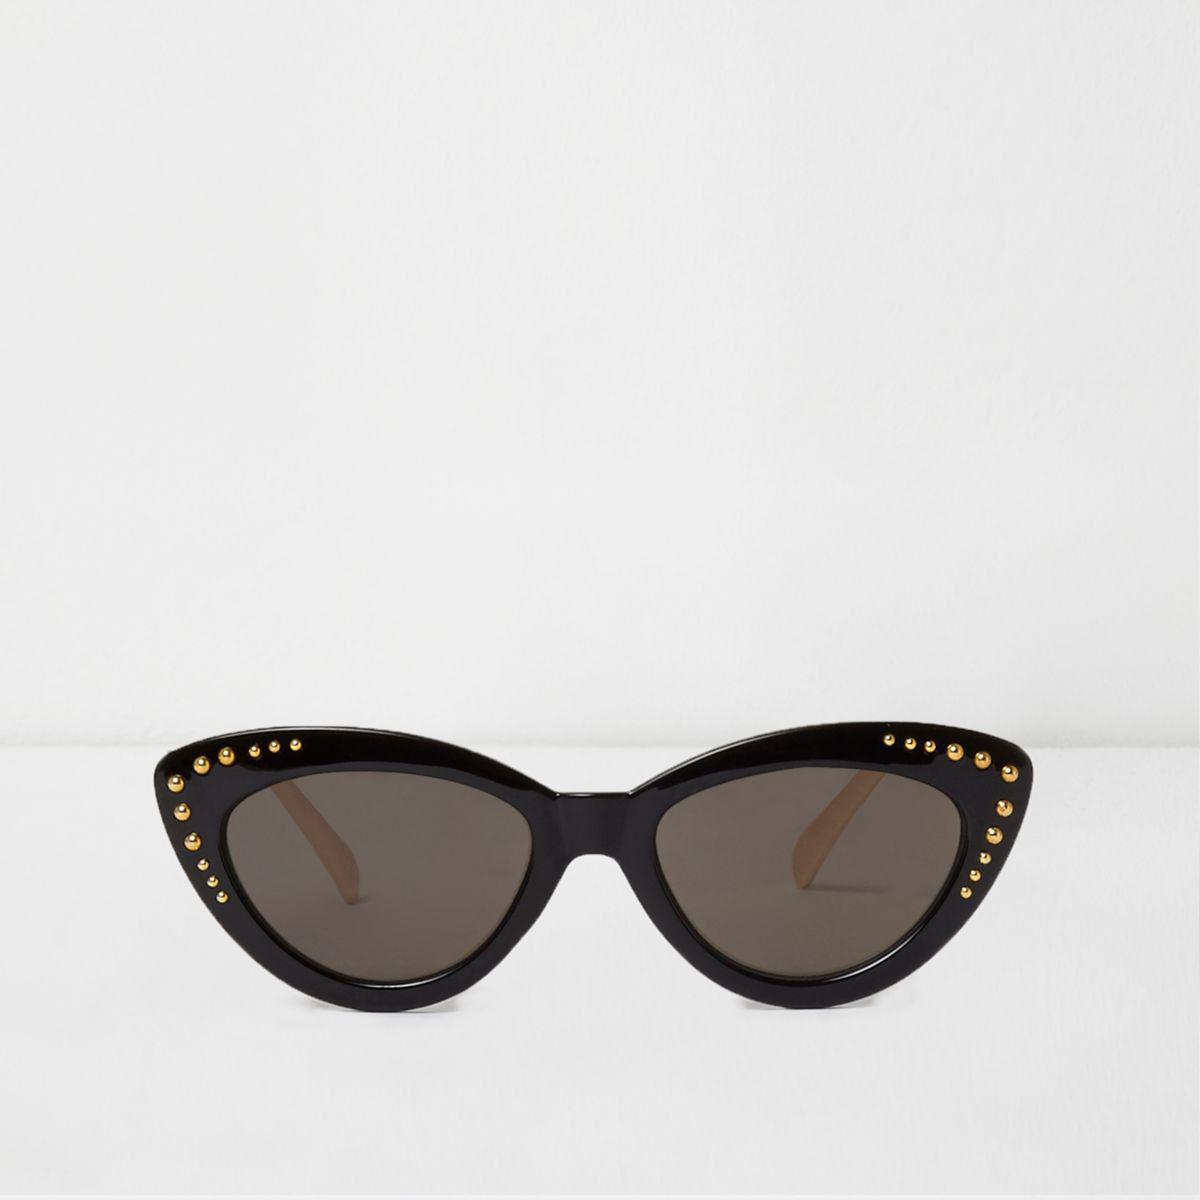 a1f7502414f PRADA Studded Ornate Cat Eye Sunglasses SPR 31Q Black 172166. Lyst - River  Island Black Studded Cat Eye Sunglasses Black Studded Cat Eye Sunglasses in  Black